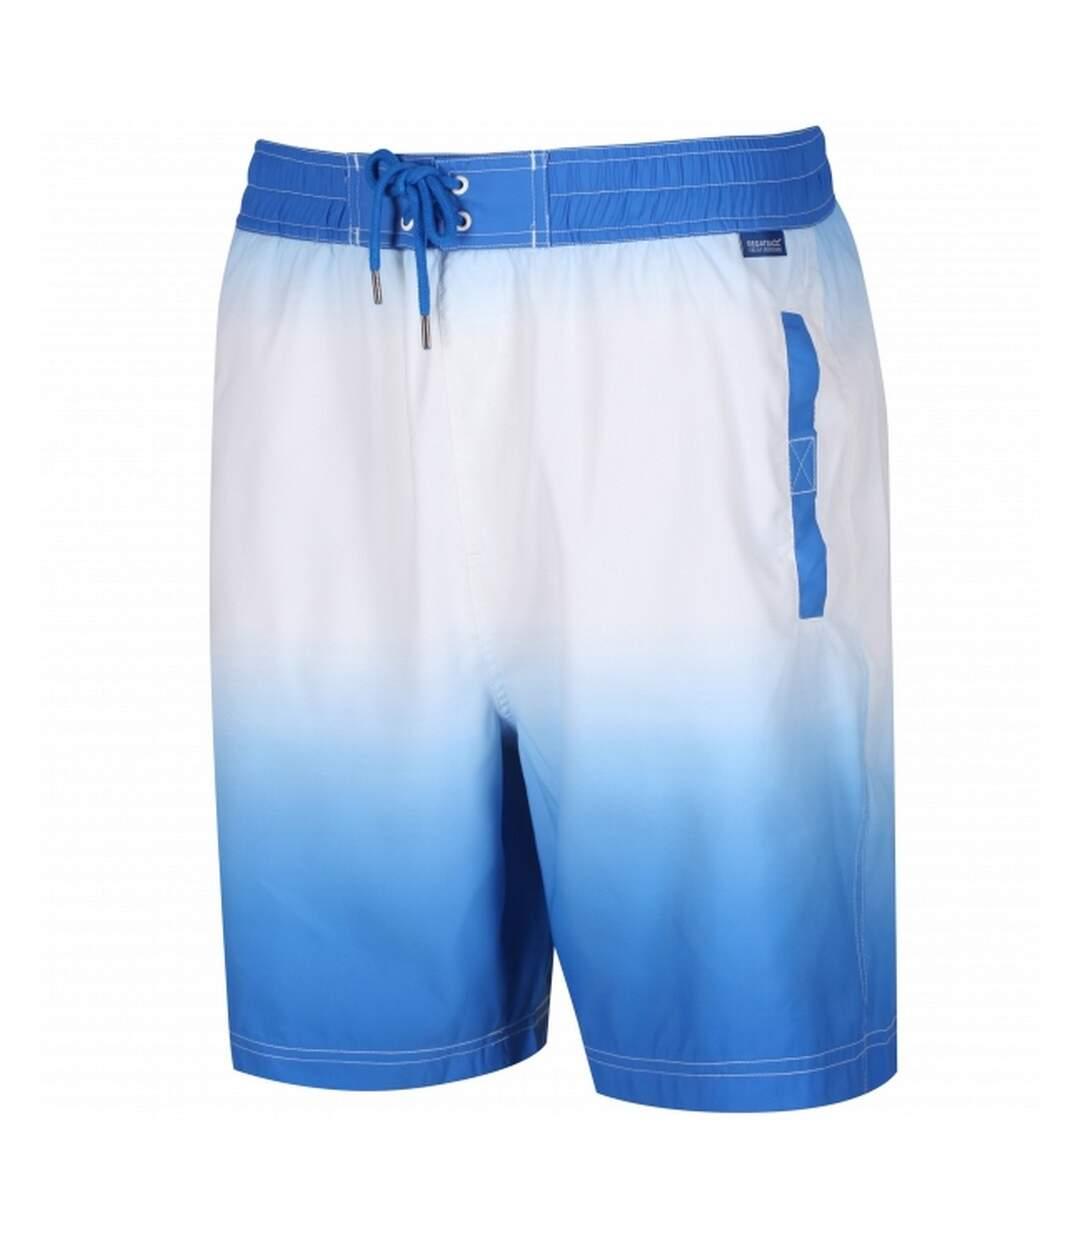 Regatta Great Outdoors Mens Hadden Board Shorts (Oxford Blue/White) - UTRG2734